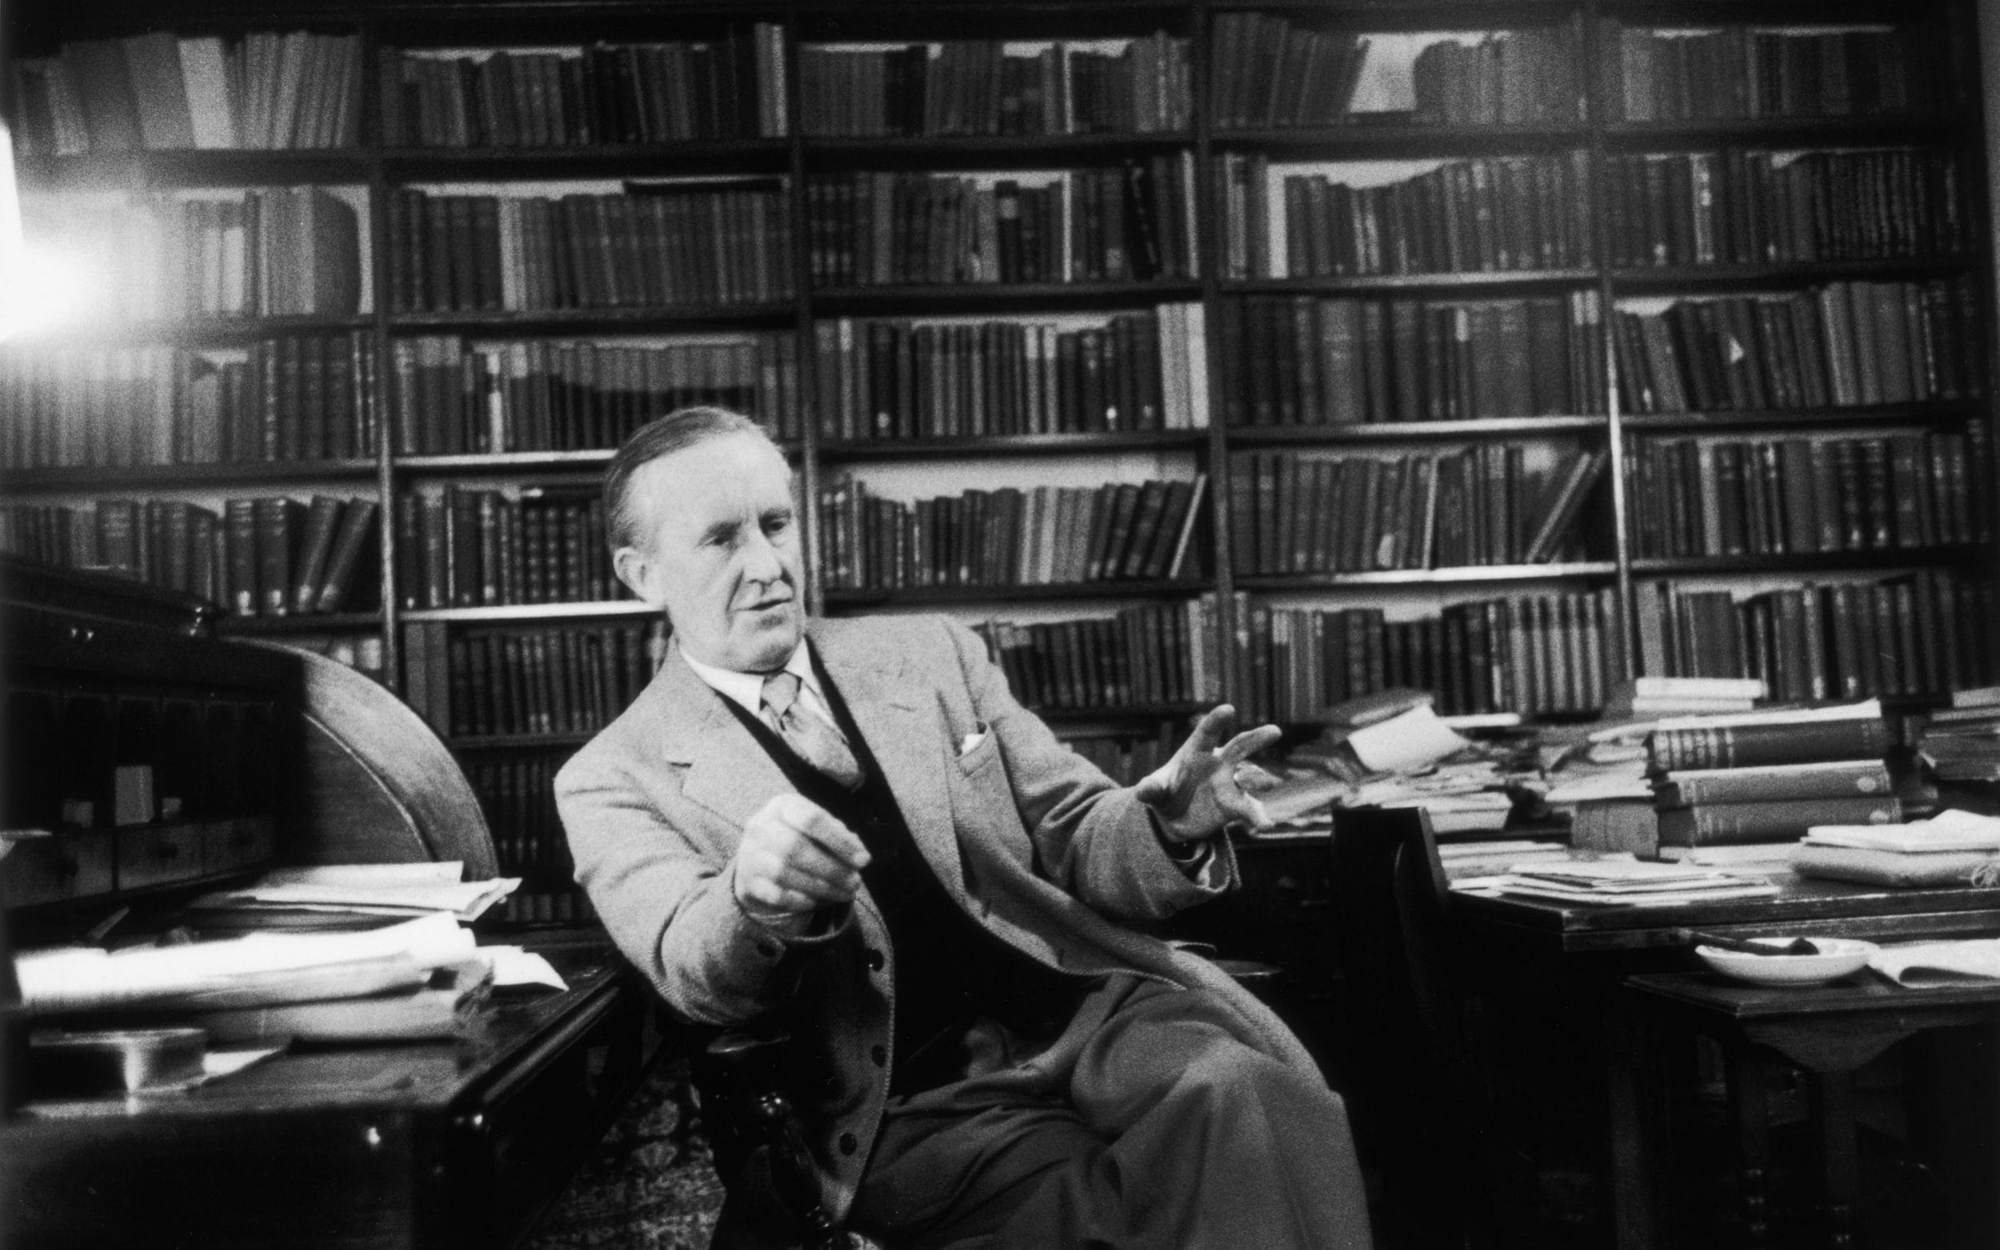 Professor JRR Tolkien in his study in Oxford